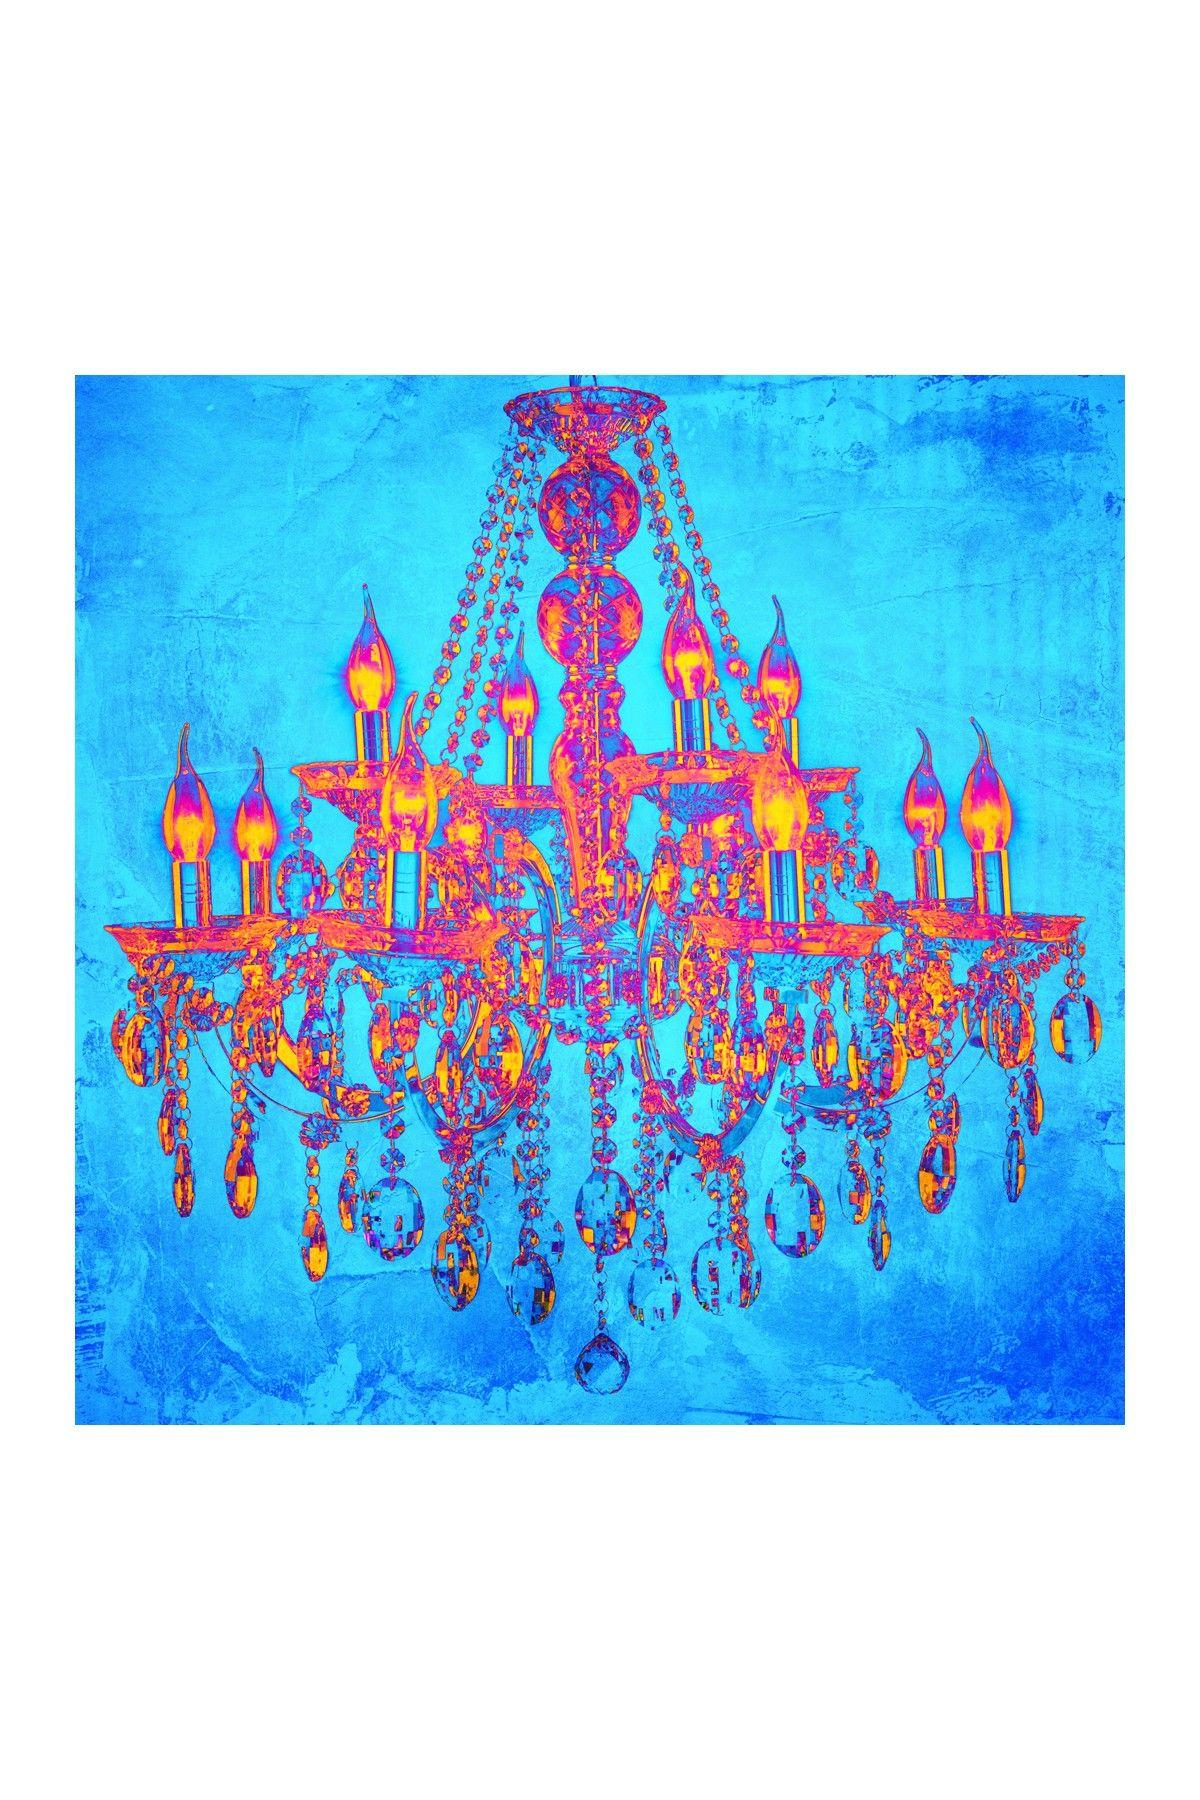 Tropic Chandelier Canvas Wall Art on HauteLook